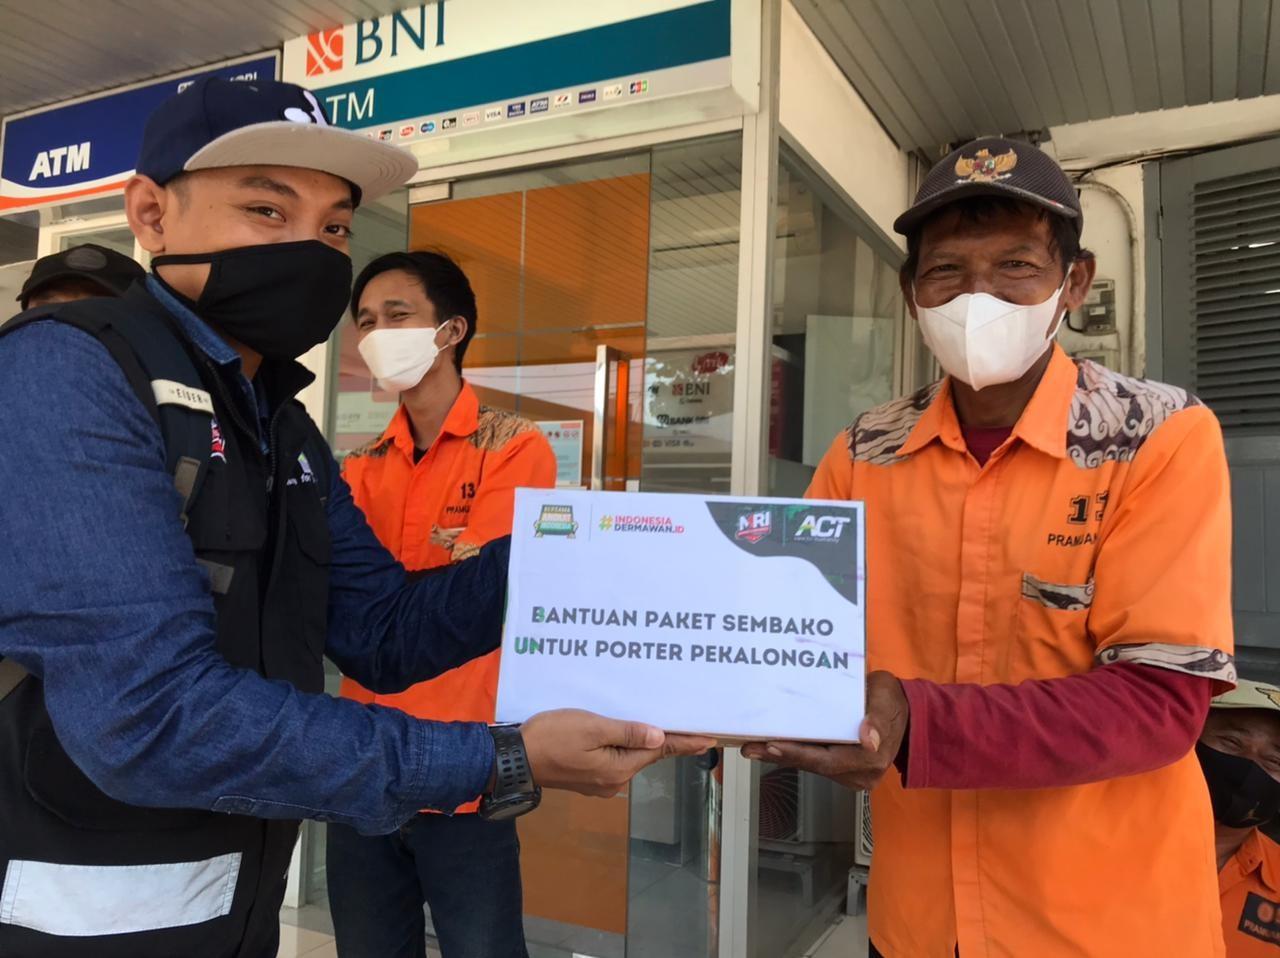 Penerimaan Bantuan Paket Pangan kepada porter Pekalongan